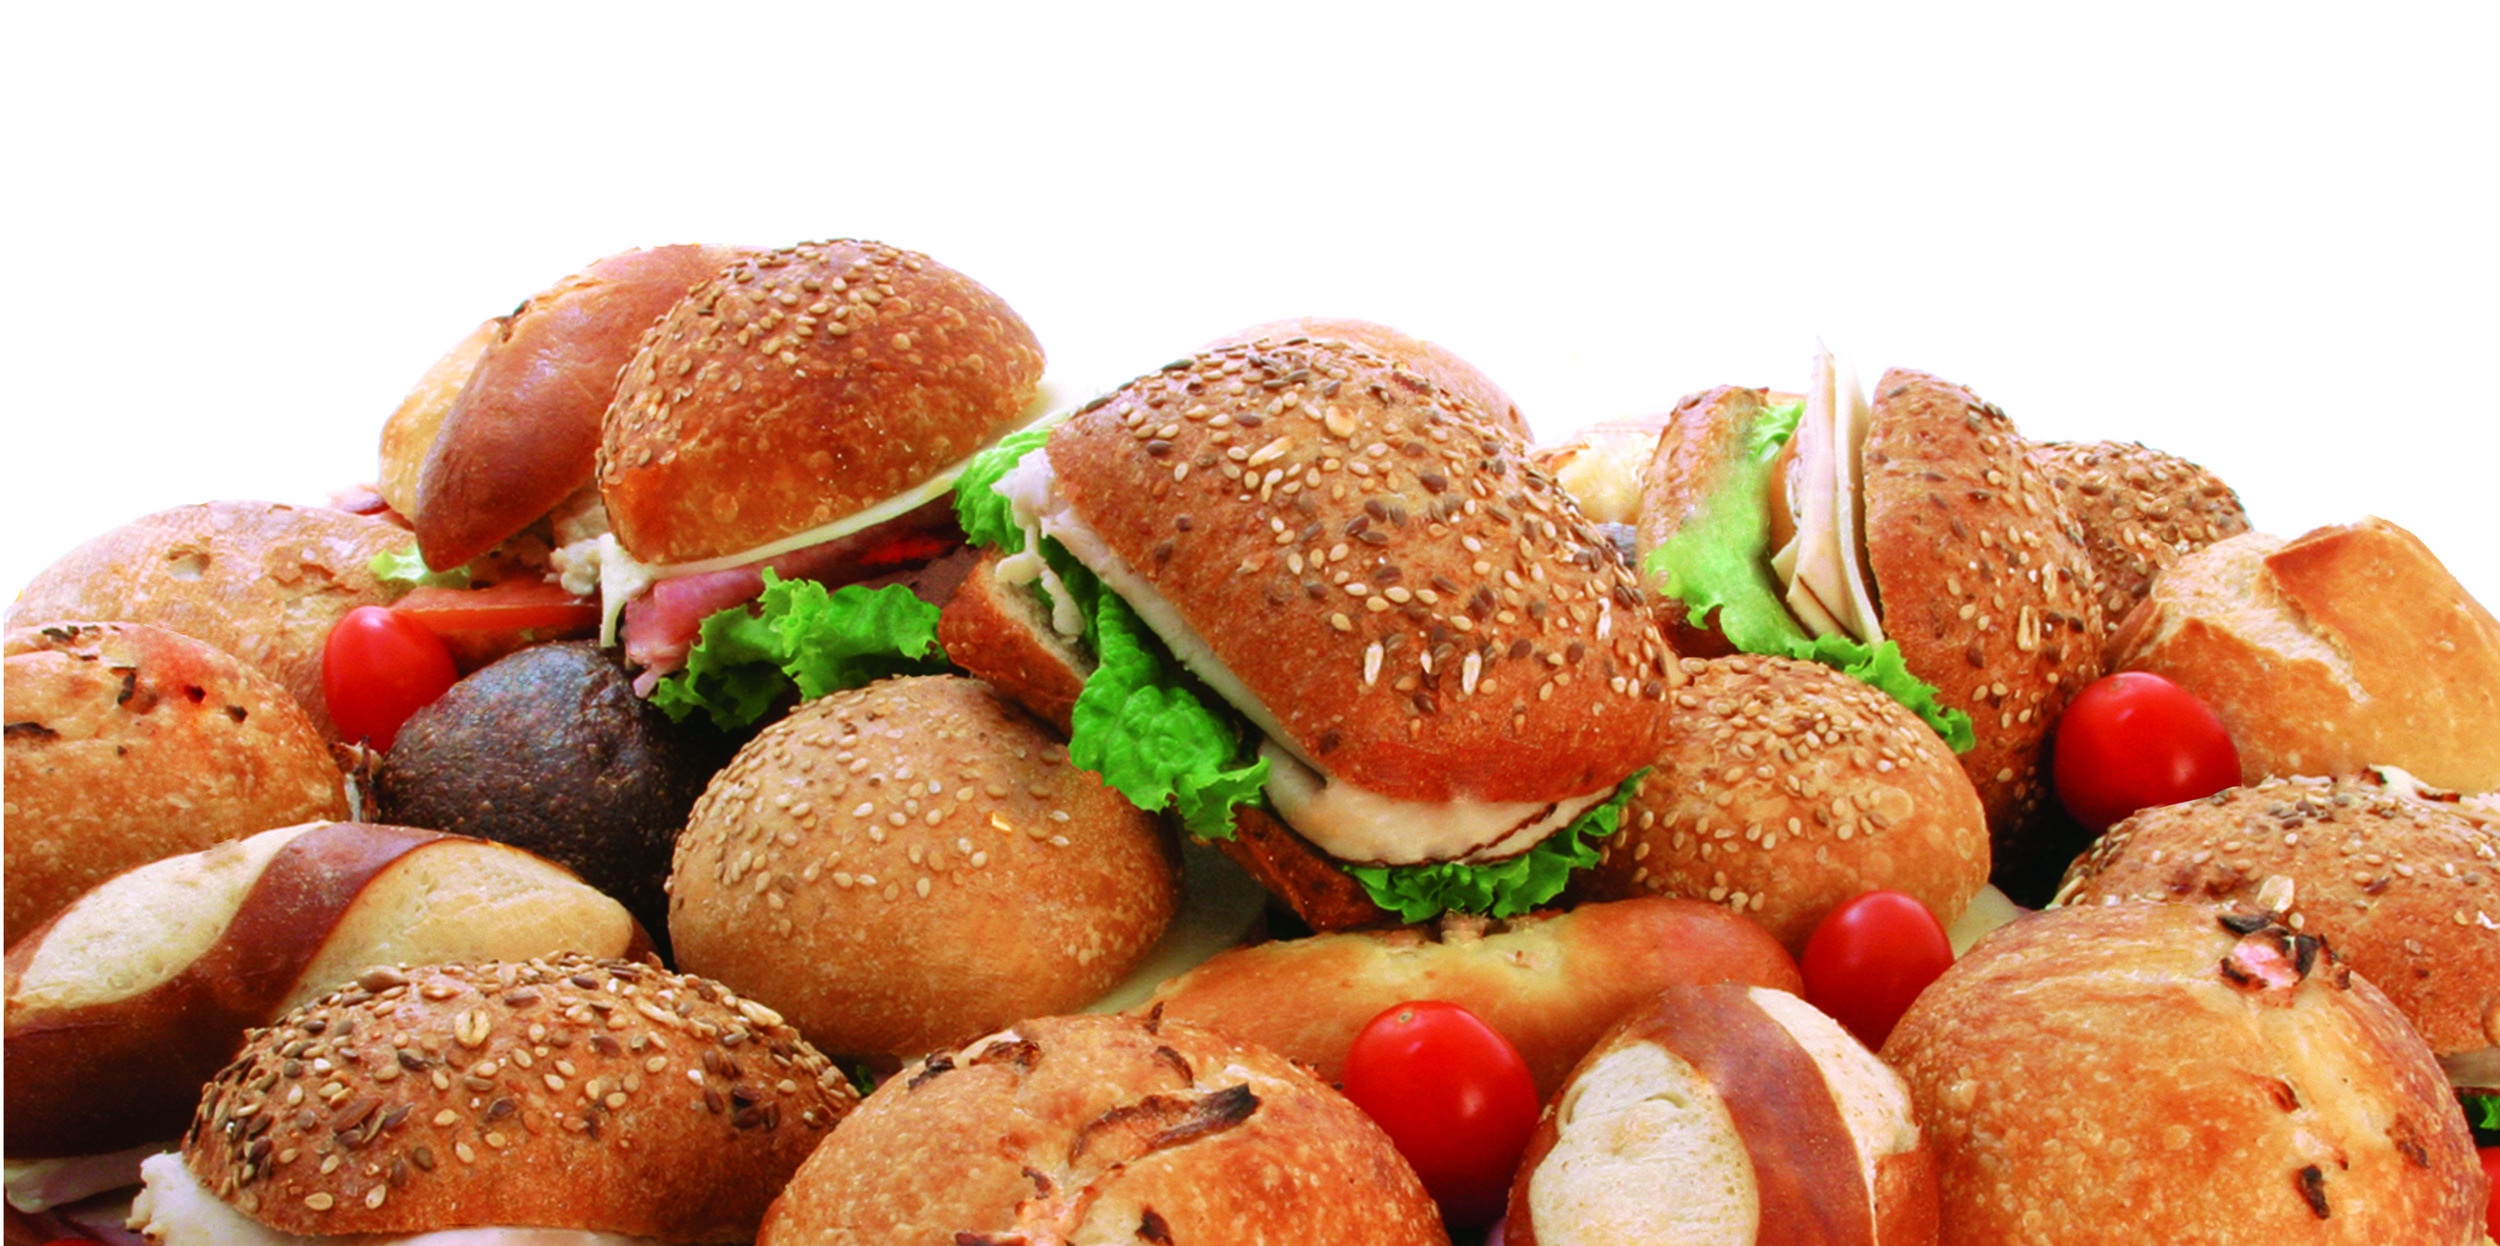 BIMMYs Sandwich Platter Image.jpg